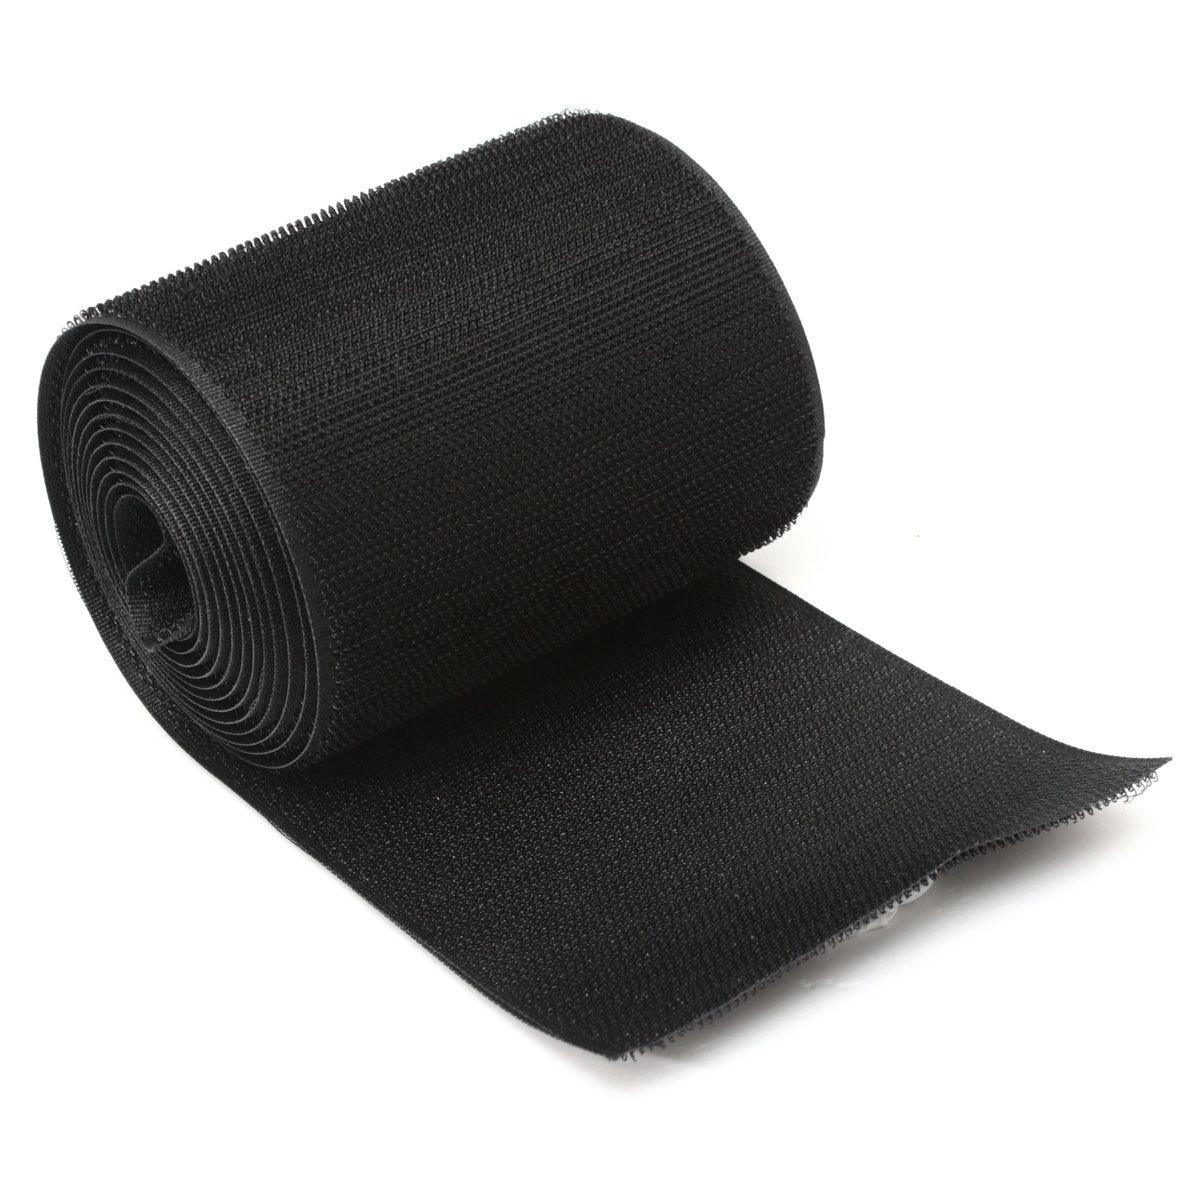 4 cable management organizer floor carpet nylon cover 2m wire sleeve pr. Black Bedroom Furniture Sets. Home Design Ideas